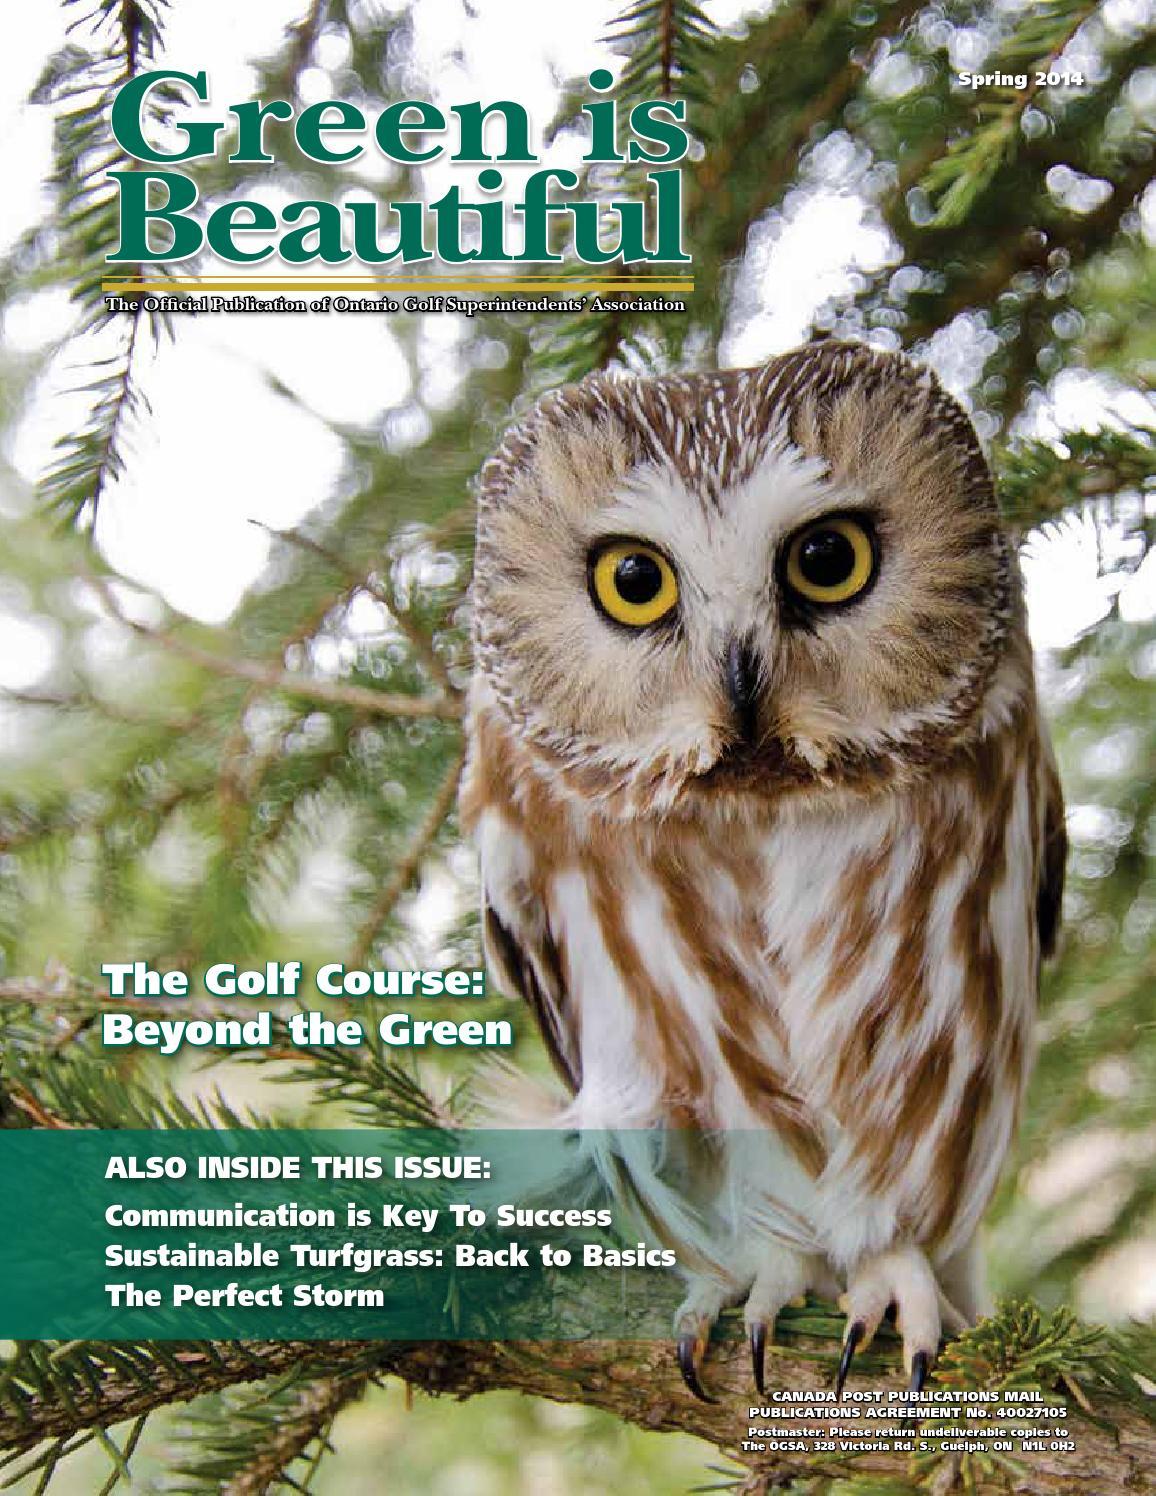 Spring 2014 Issue by Blenheim - issuu